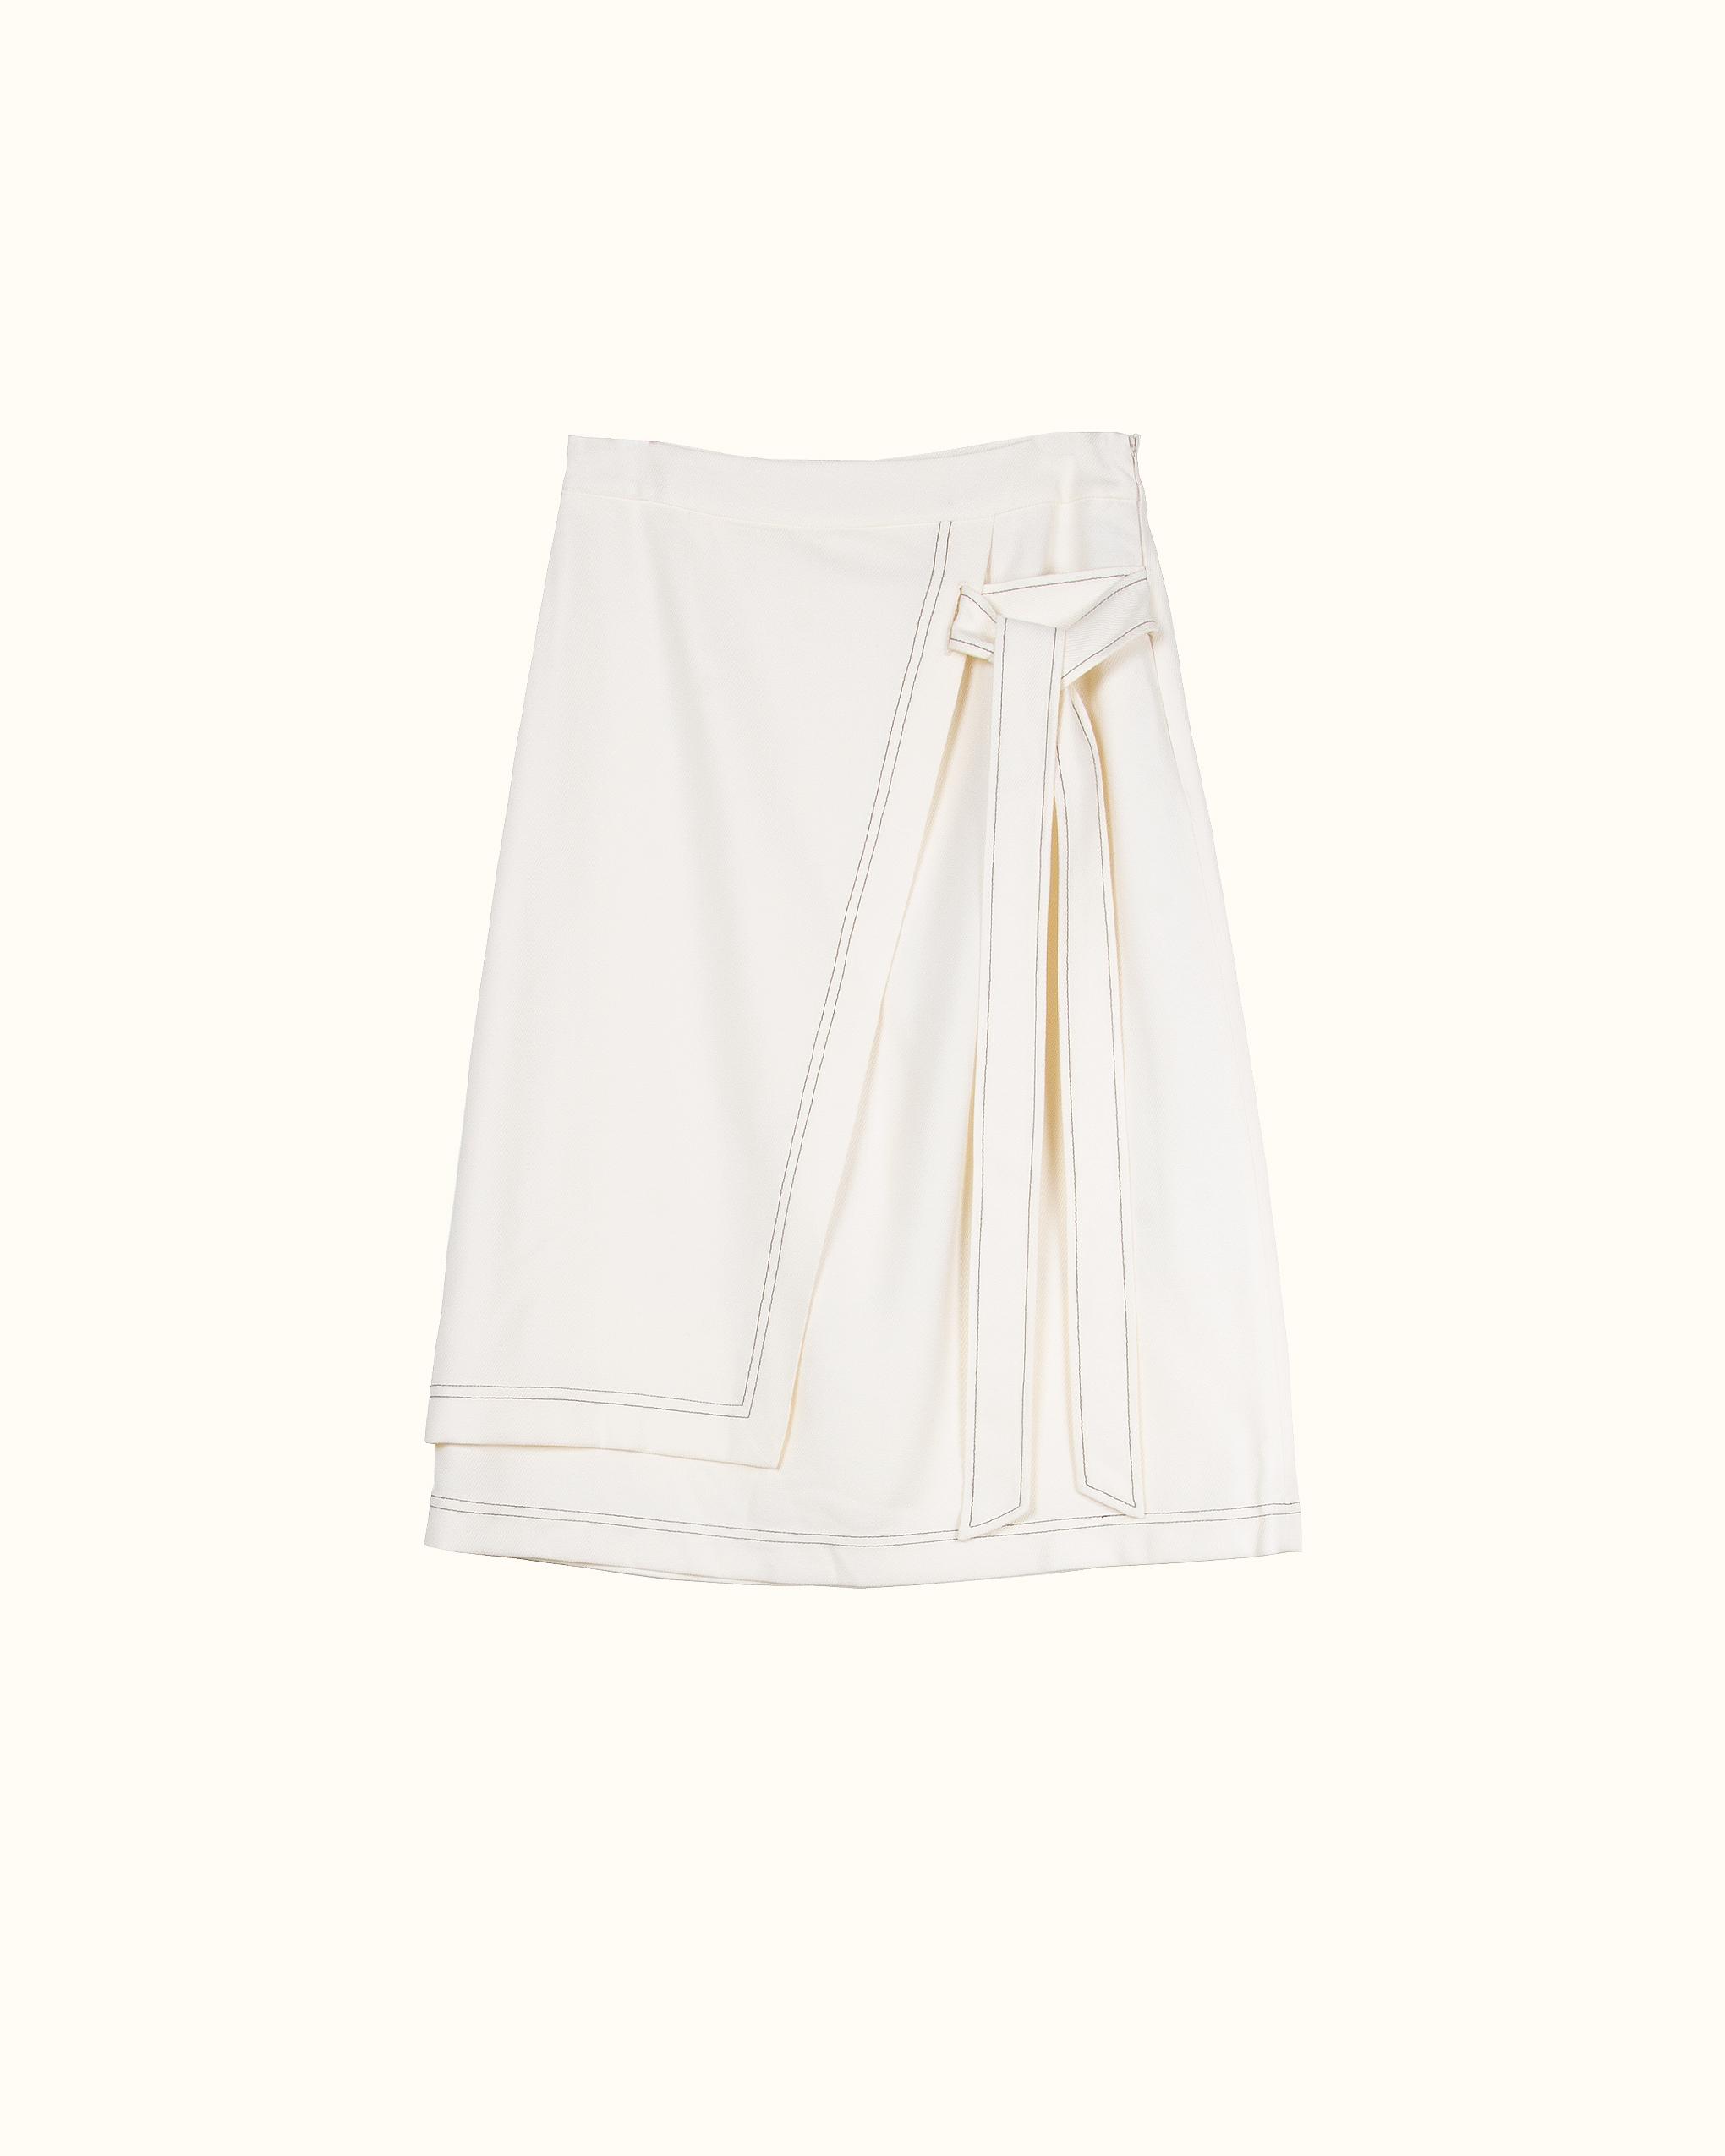 Cream double-layer belted warp skirt.